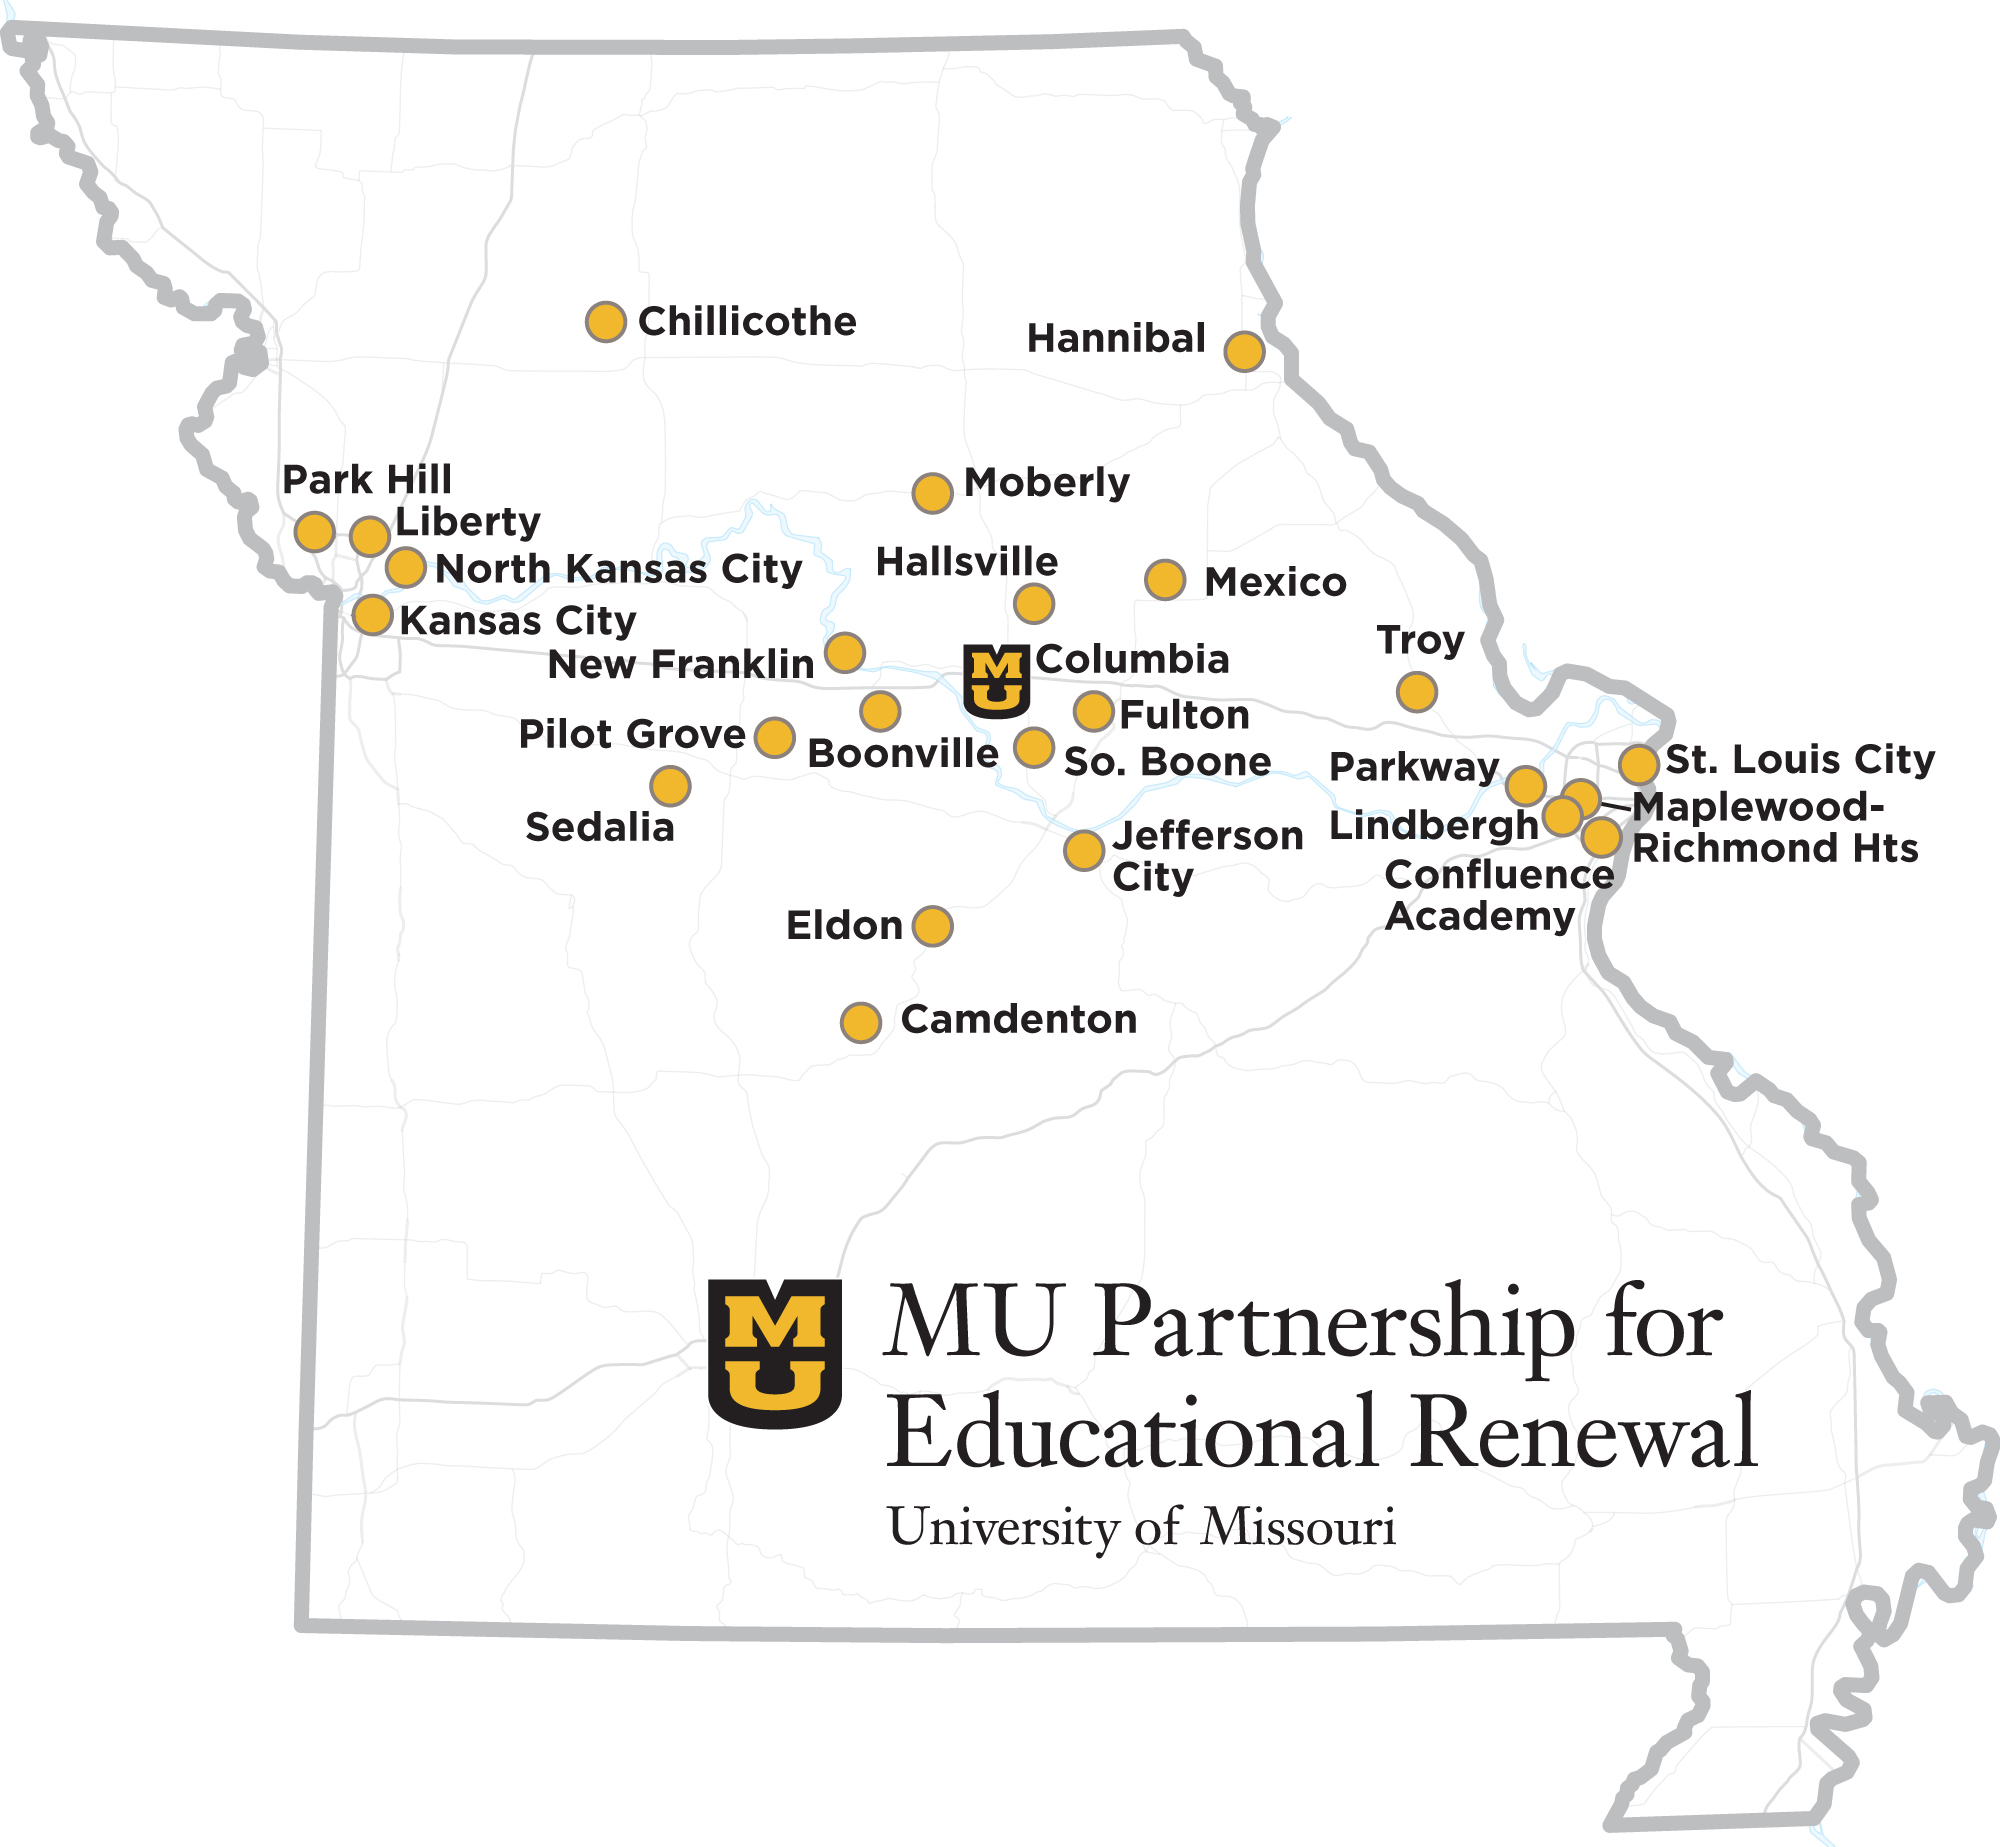 MU Partnership for Educational Renewal Partner Districts map, University of Missouri College of Education